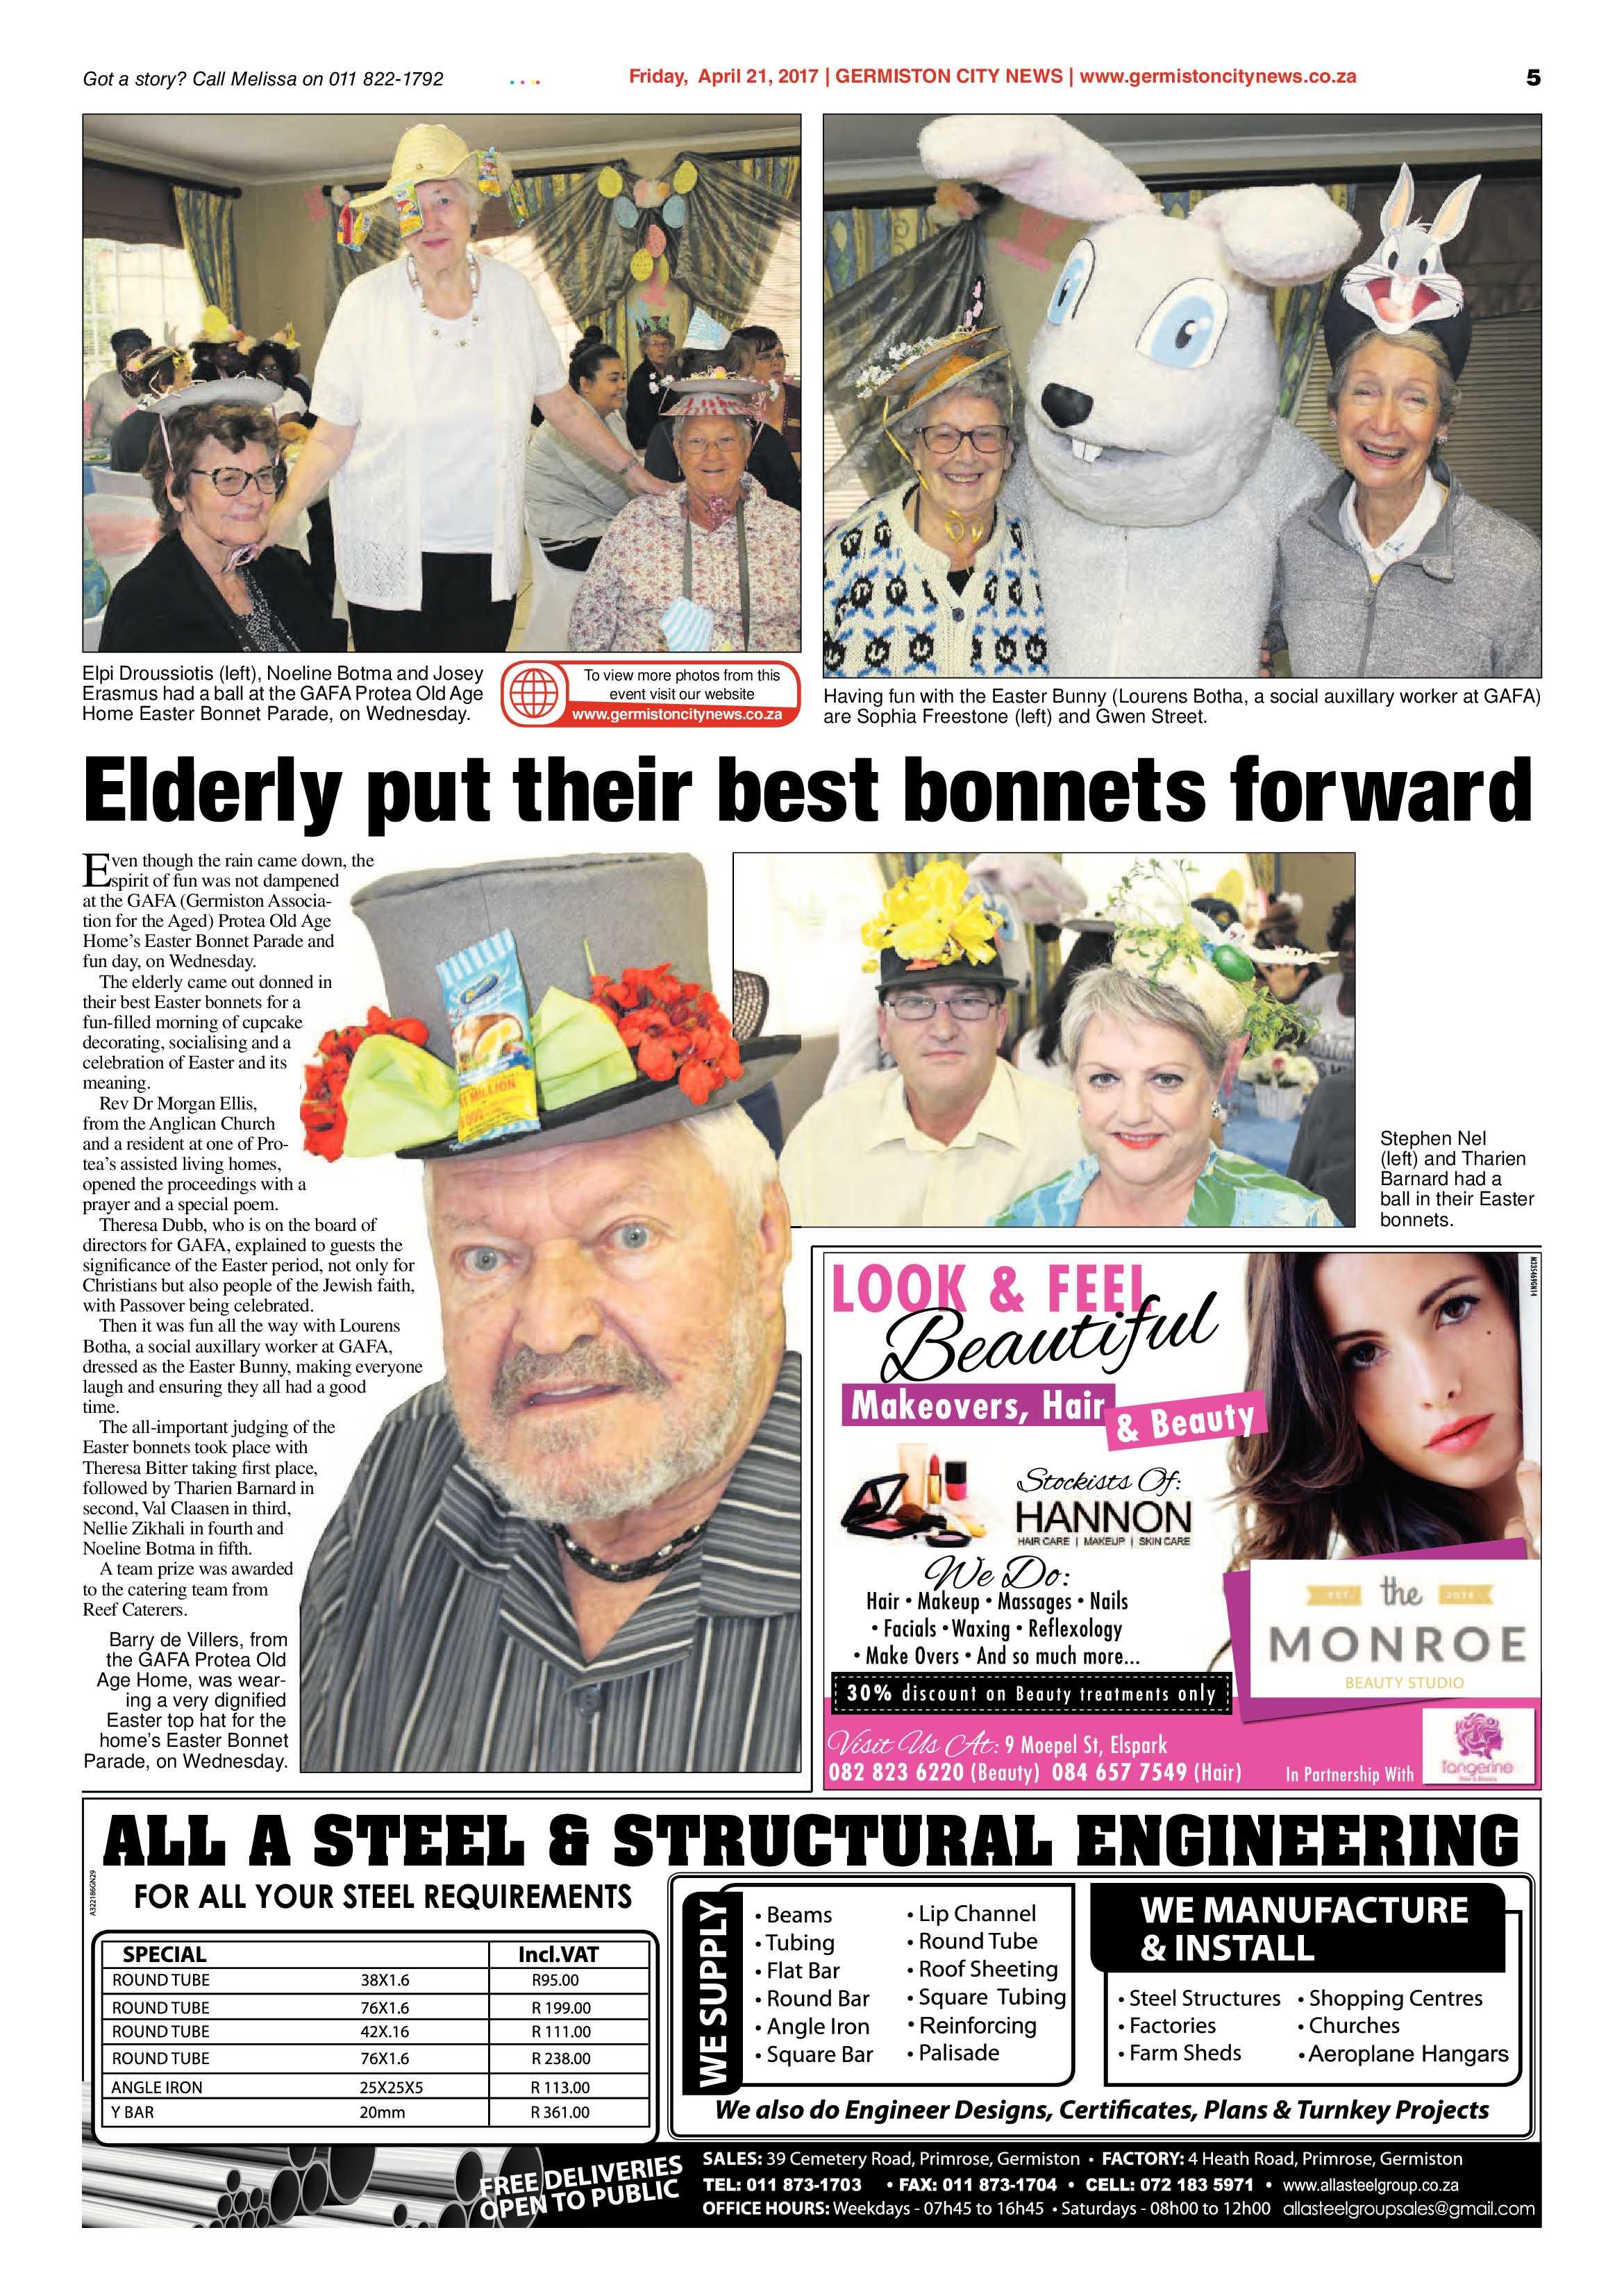 germiston-city-news-19-april-2017-epapers-page-5